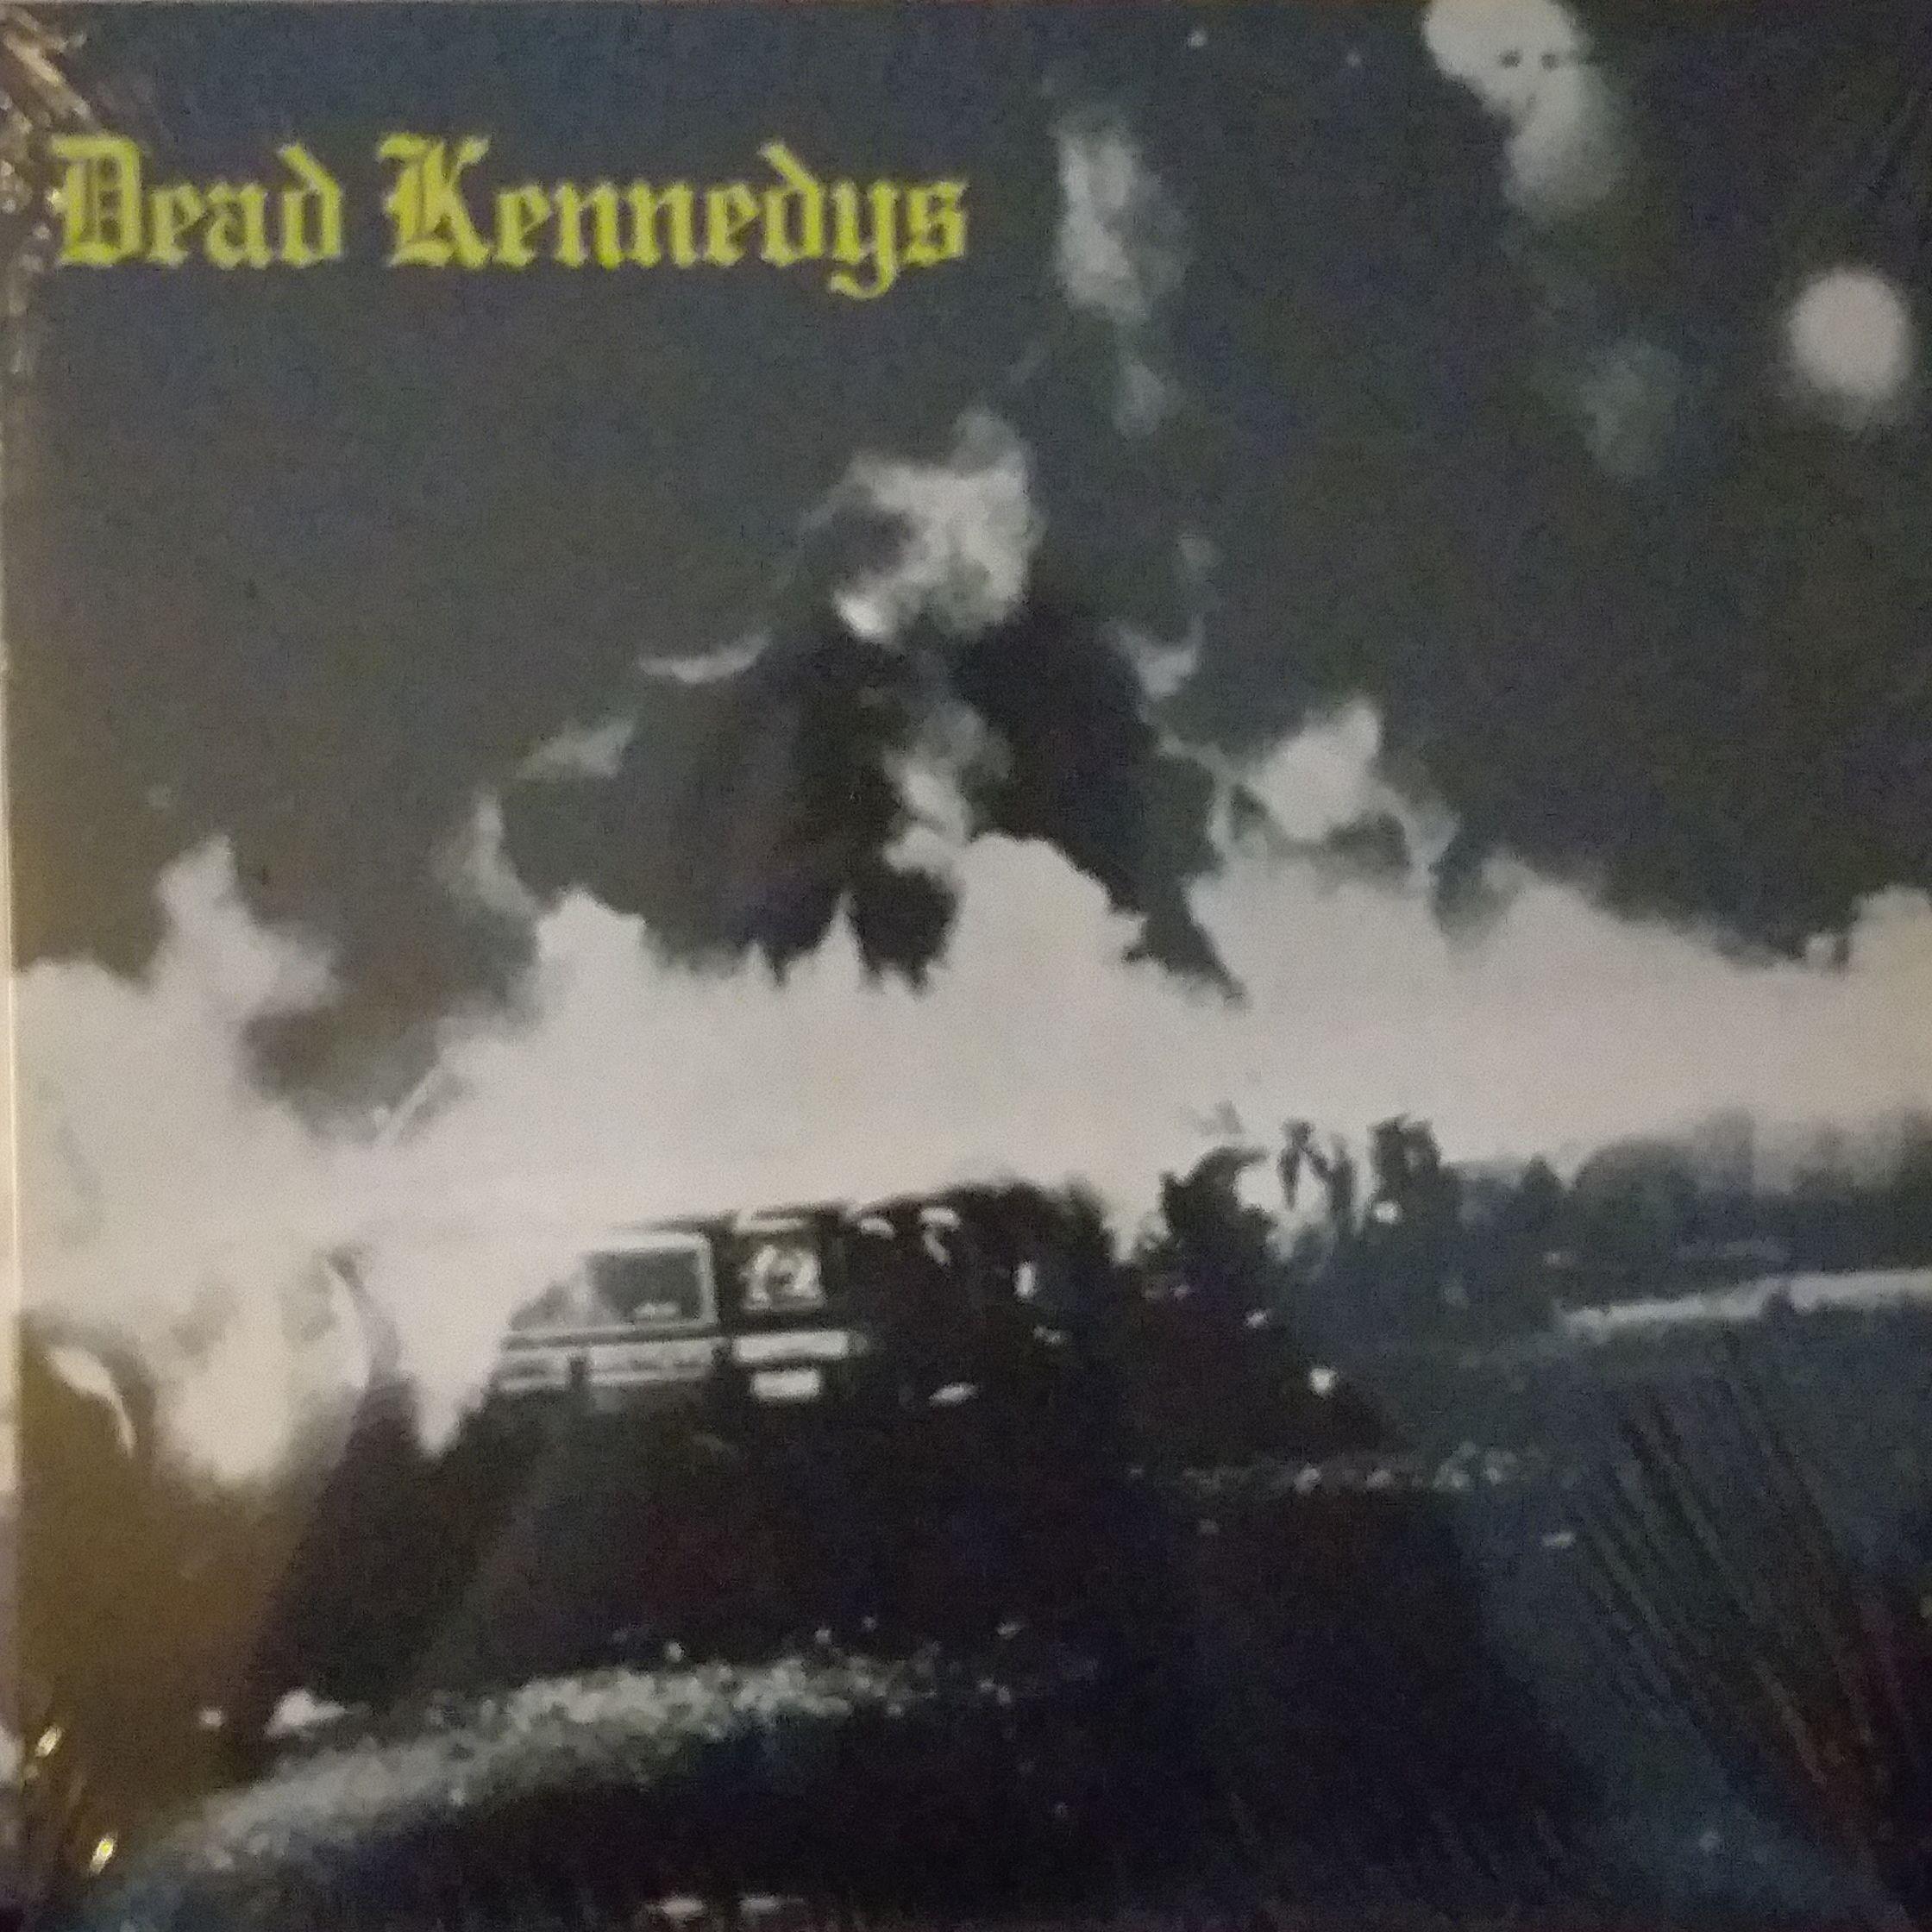 Dead Kennedys Fresh fruit for rotting vegetables LP undefined